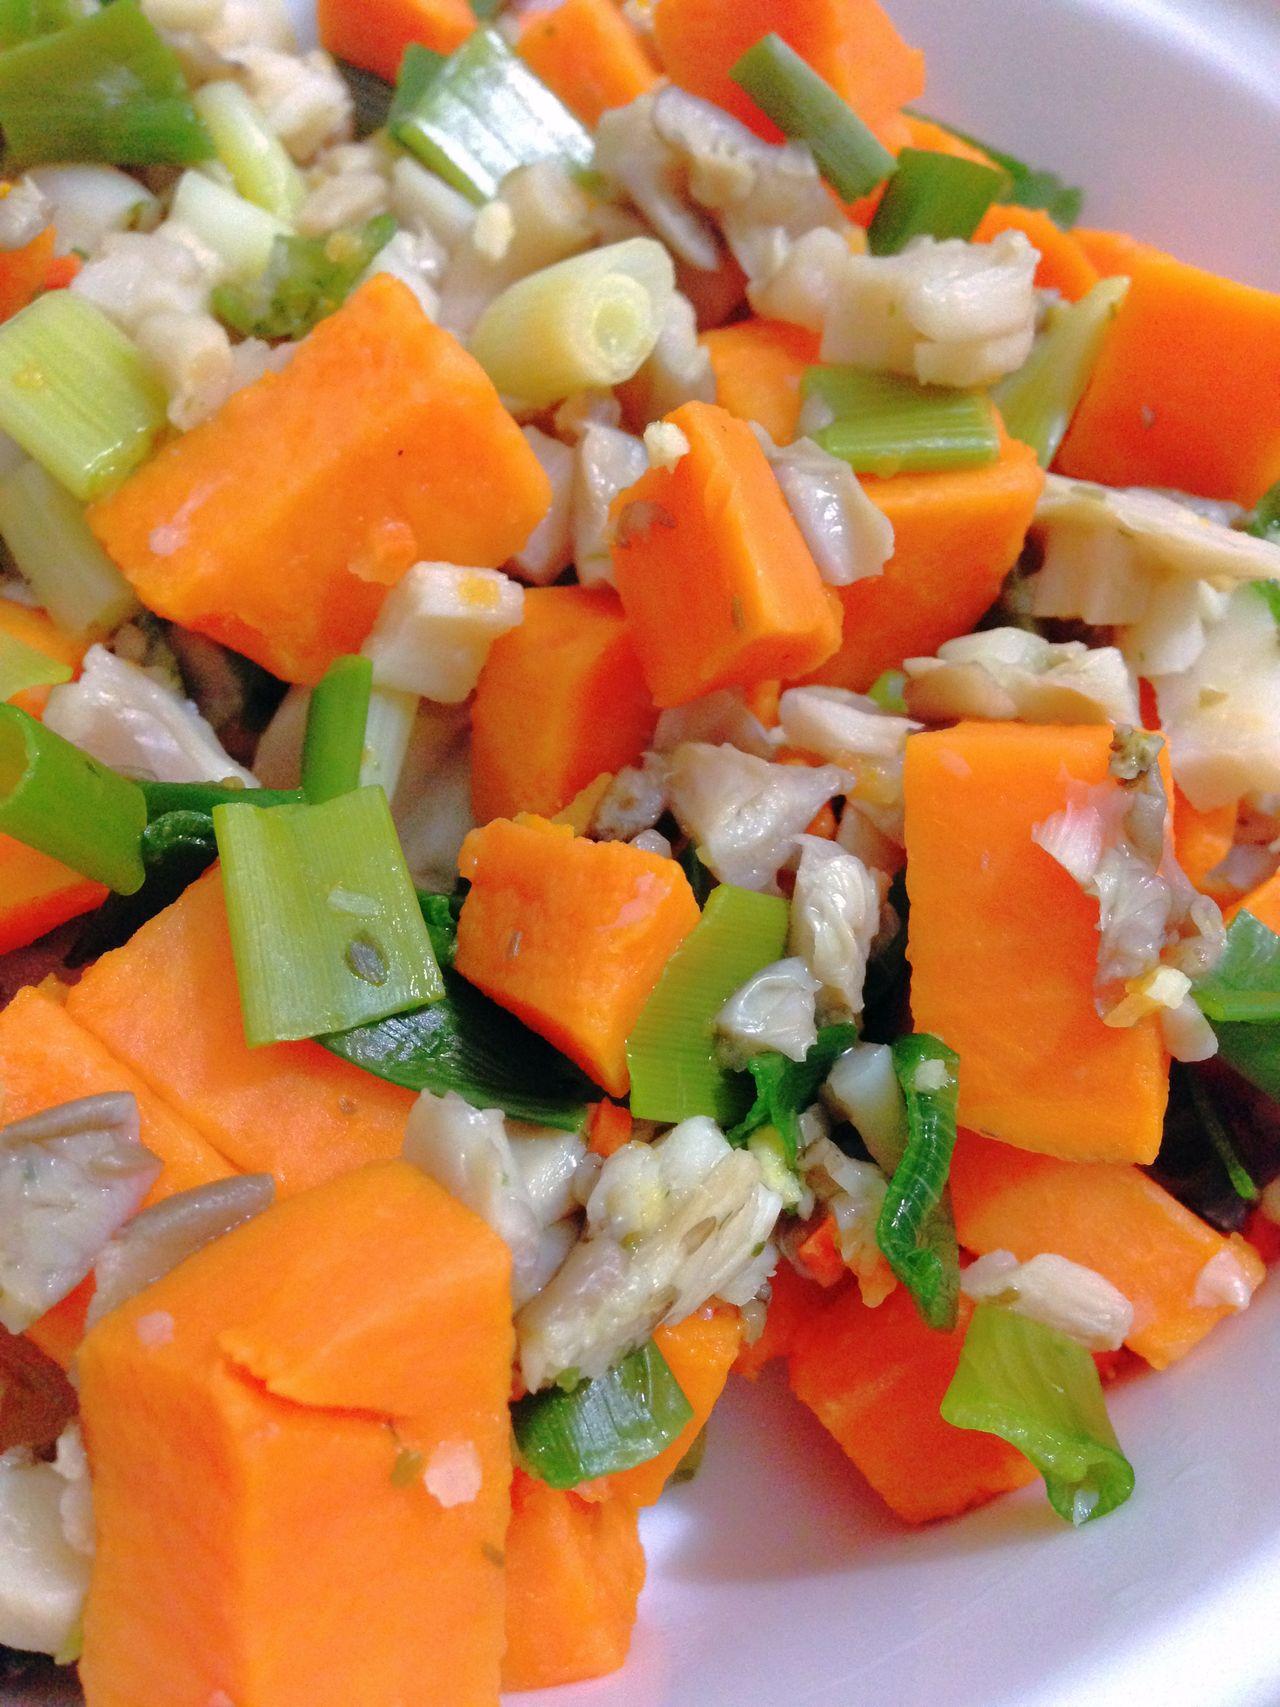 Sweet Potatoes Green Onion Oyster Mushrooms Vegetables Vegetarian Food Vegan Food 365 Photos In 2015 Healthy Food Closeup